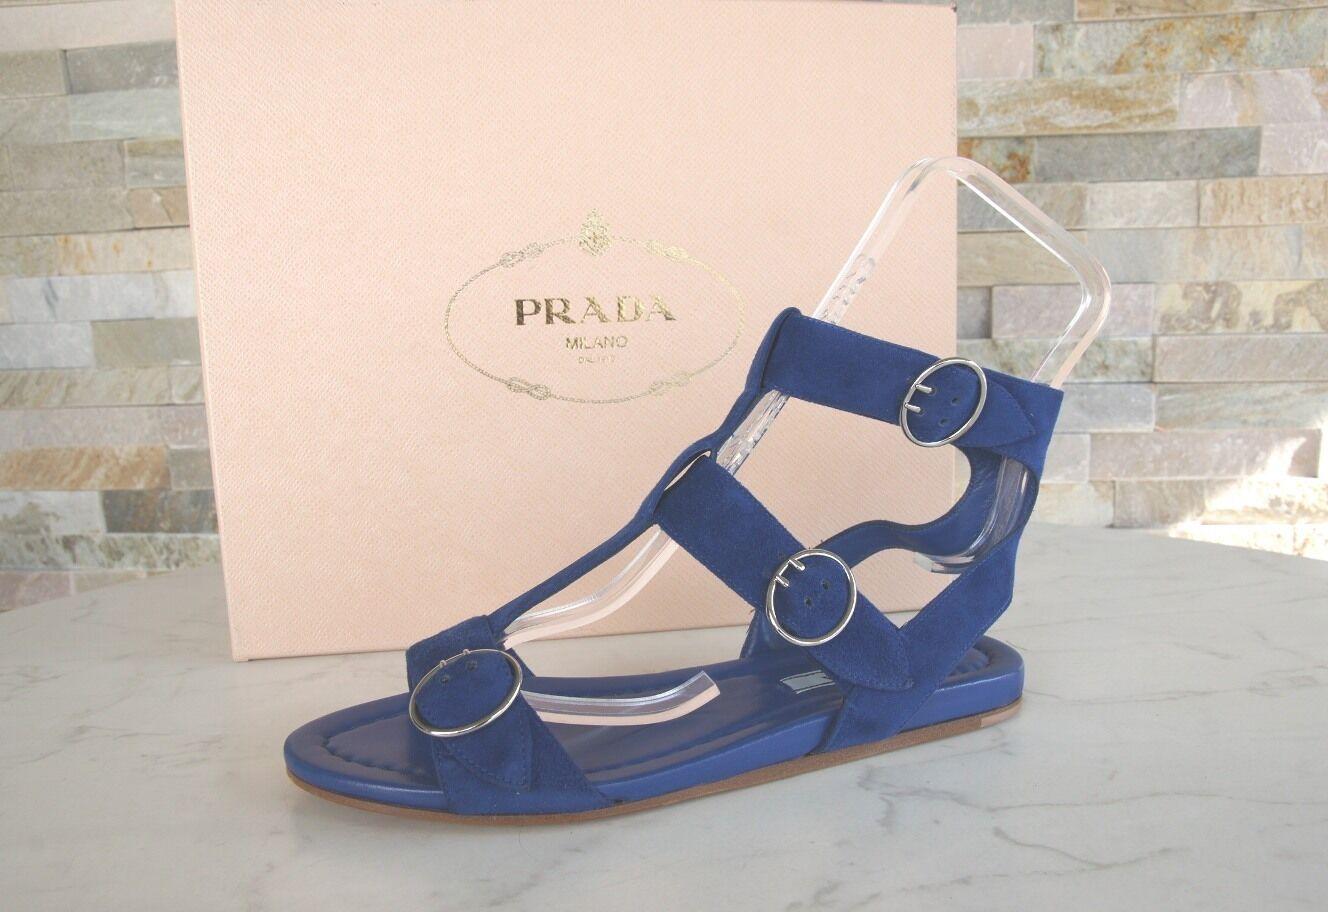 Luxus PRADA Gr 36 Sandalen RiemenSandale Schuhe Ziegenleder blau NEU